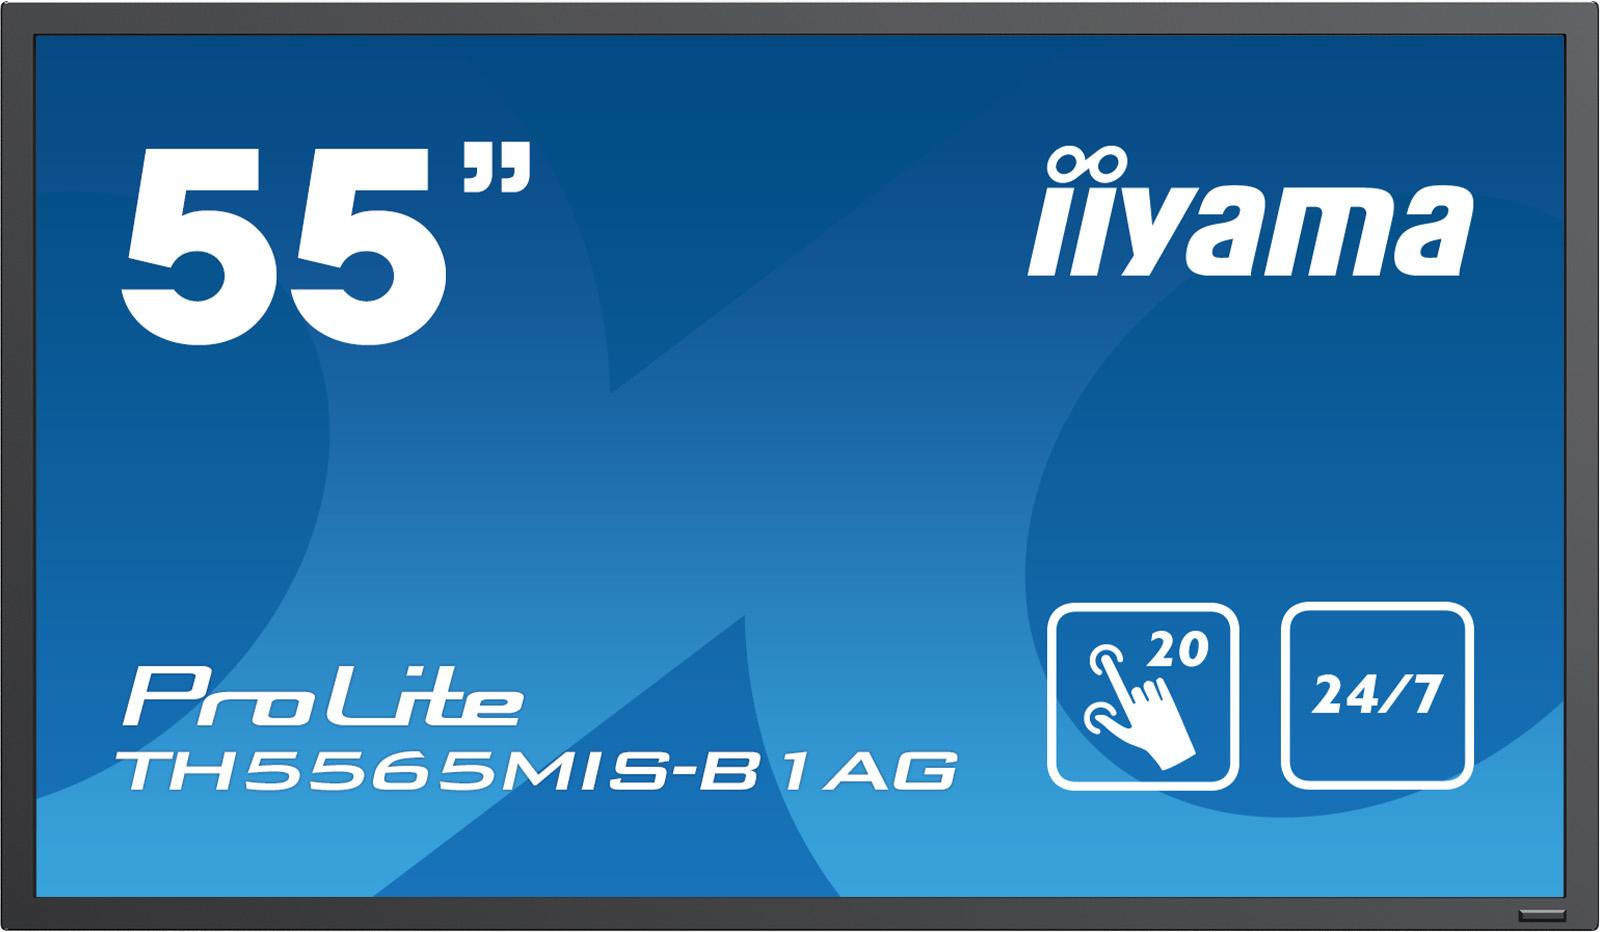 IIYAMA ProLite TH5565MIS-B1AG 138,8cm 54,6Zoll IPS antiglare multitouch 1920x1080 450cd/m² 12ms Speaker VGA3xHDMI USBMediaPlayer24/7